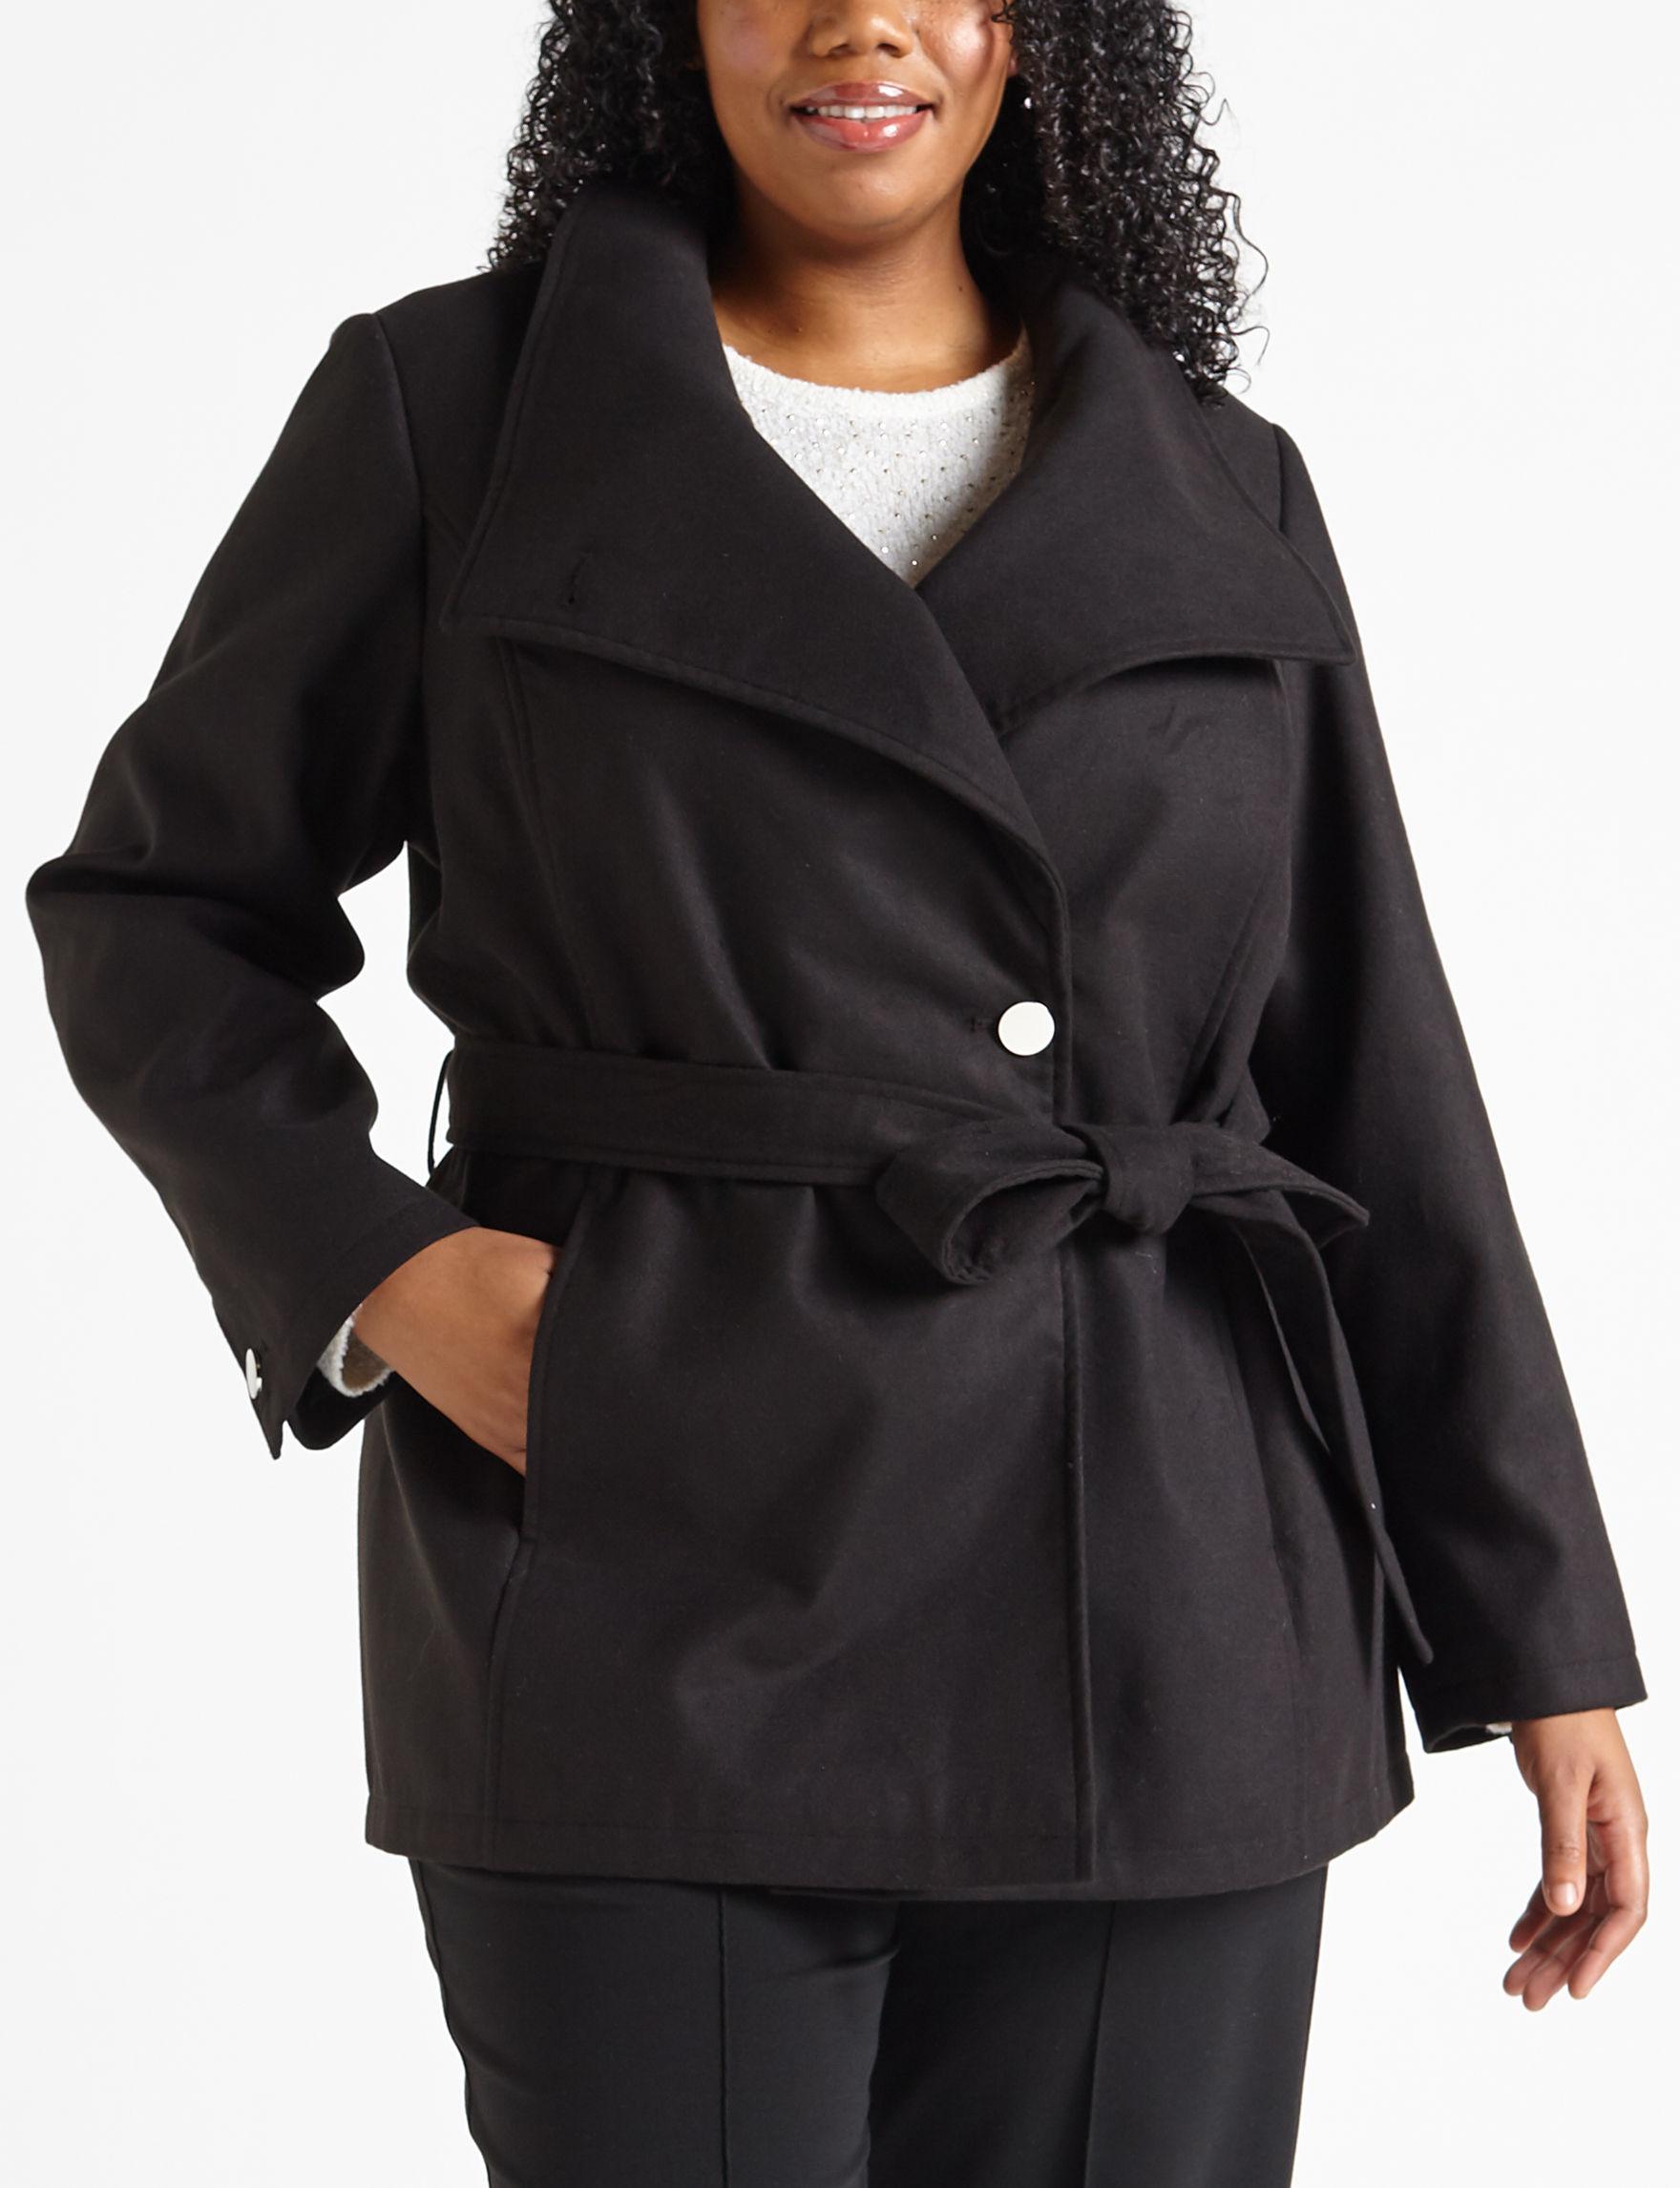 Details Black Peacoats & Overcoats